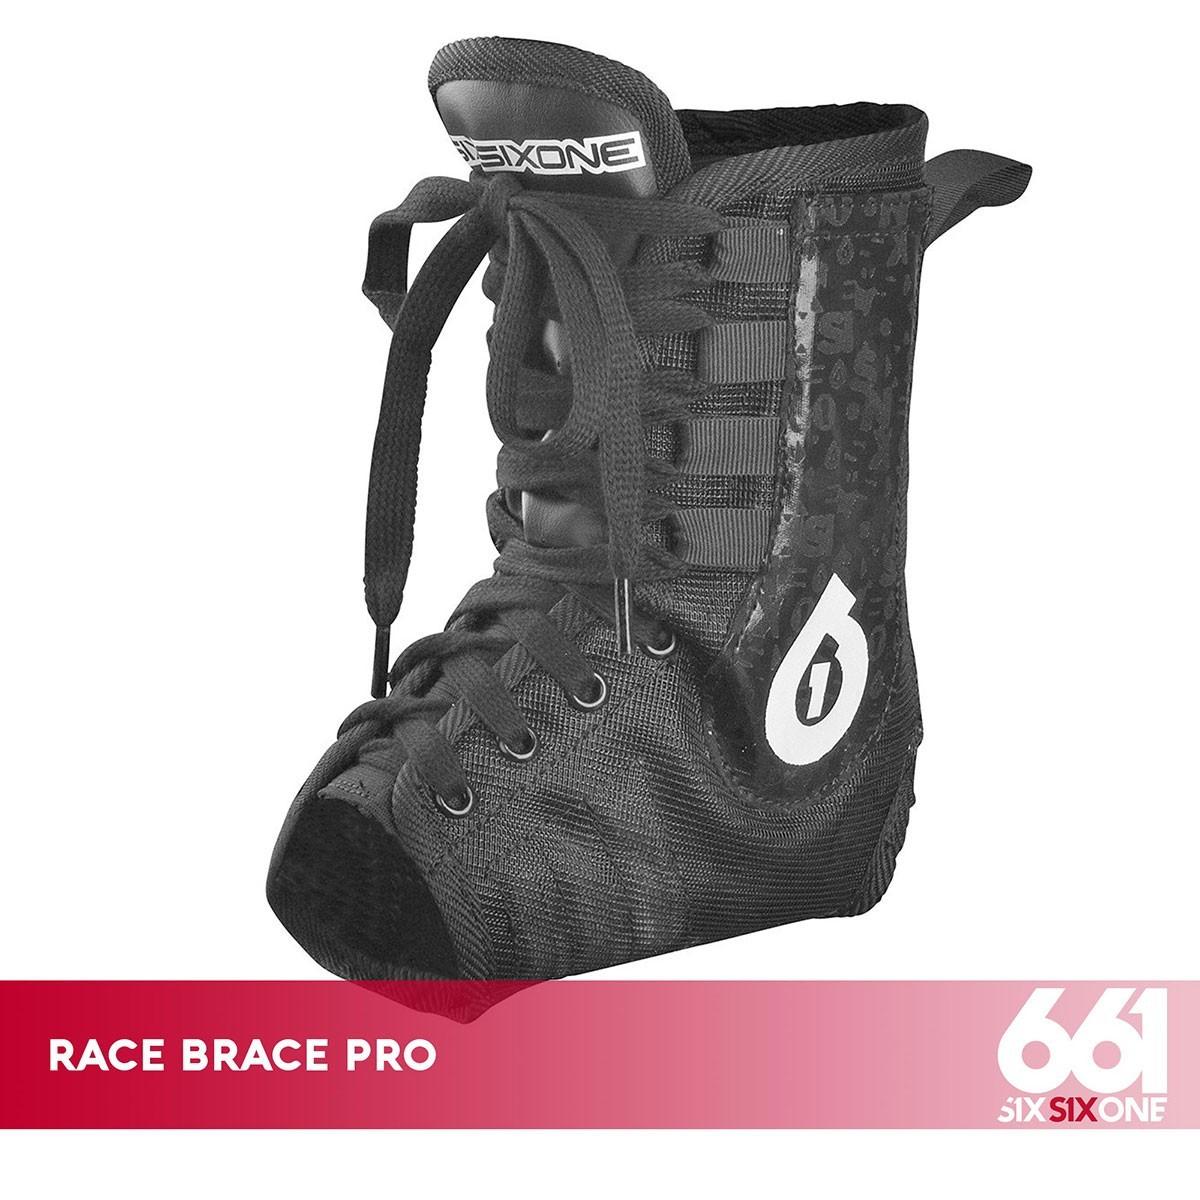 661 RACE BRACE PRO BLACK - Изображение - AQUAMATRIX